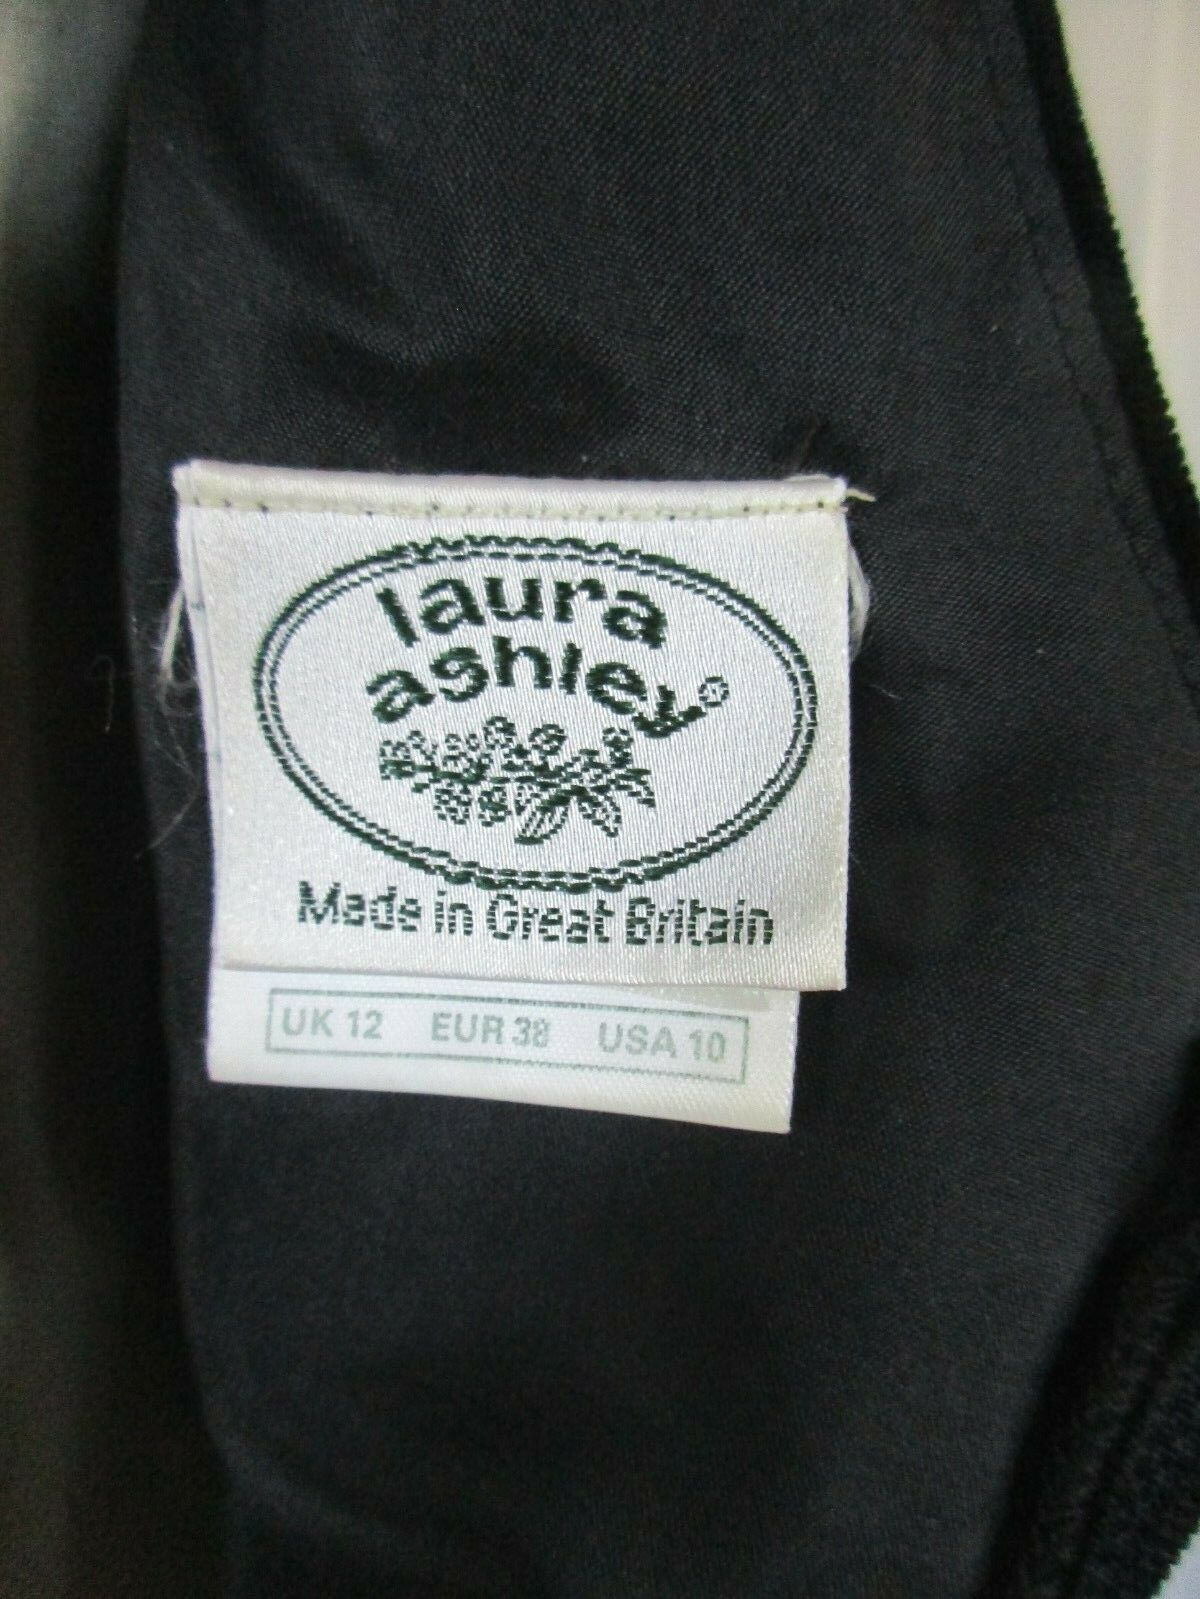 Vintage Laura Ashley Party Dress 1980s 1990s Blac… - image 5